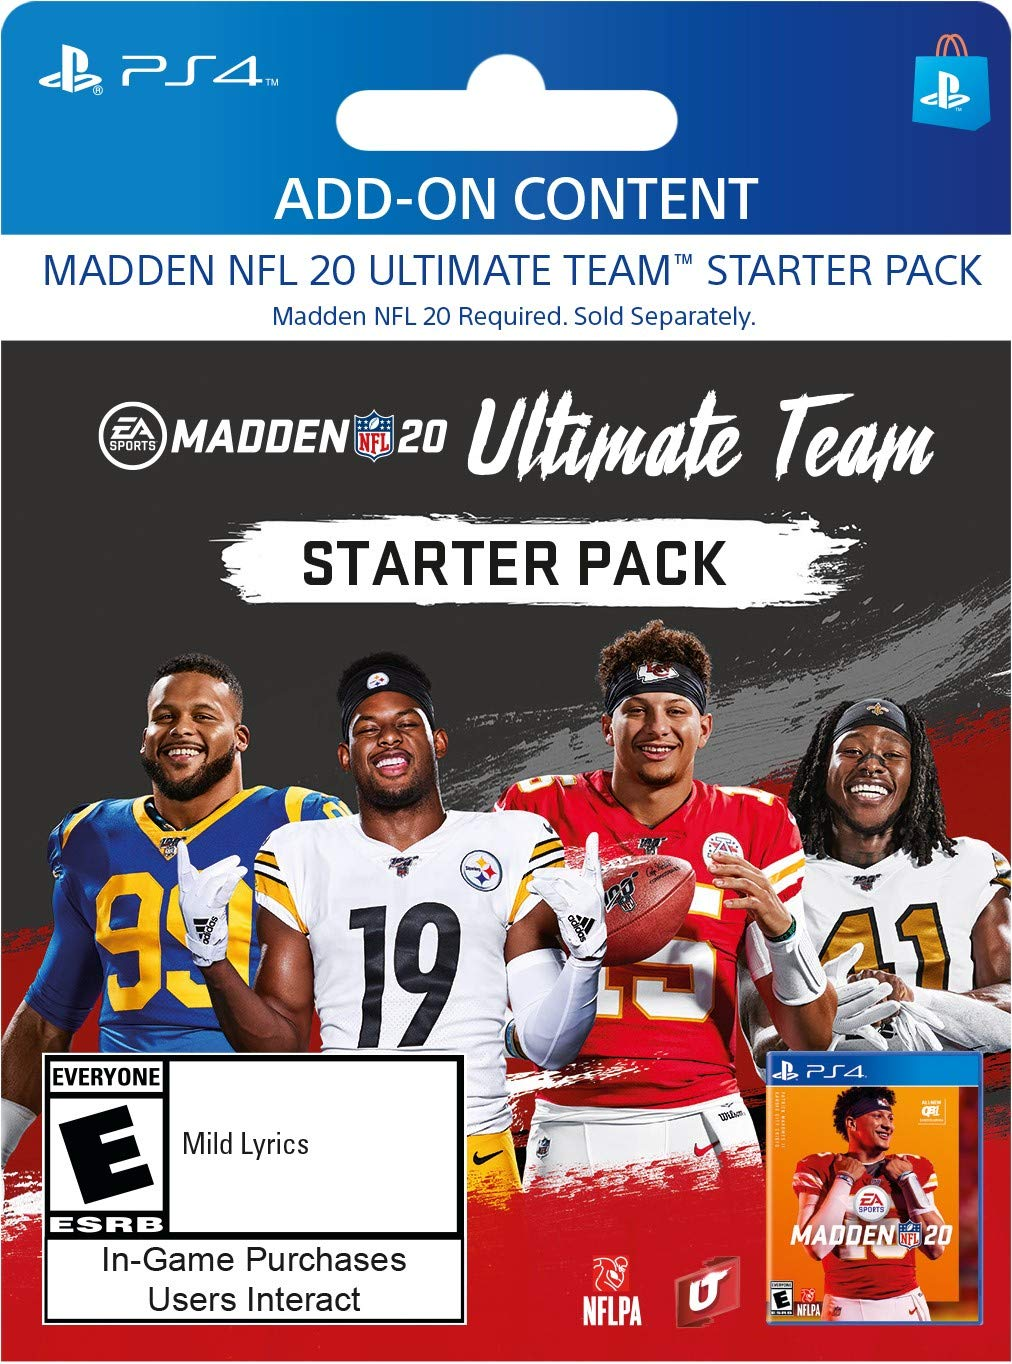 Madden NFL 20: Madden Ultimate Team Starter Pack - [PS4 Digital Code]